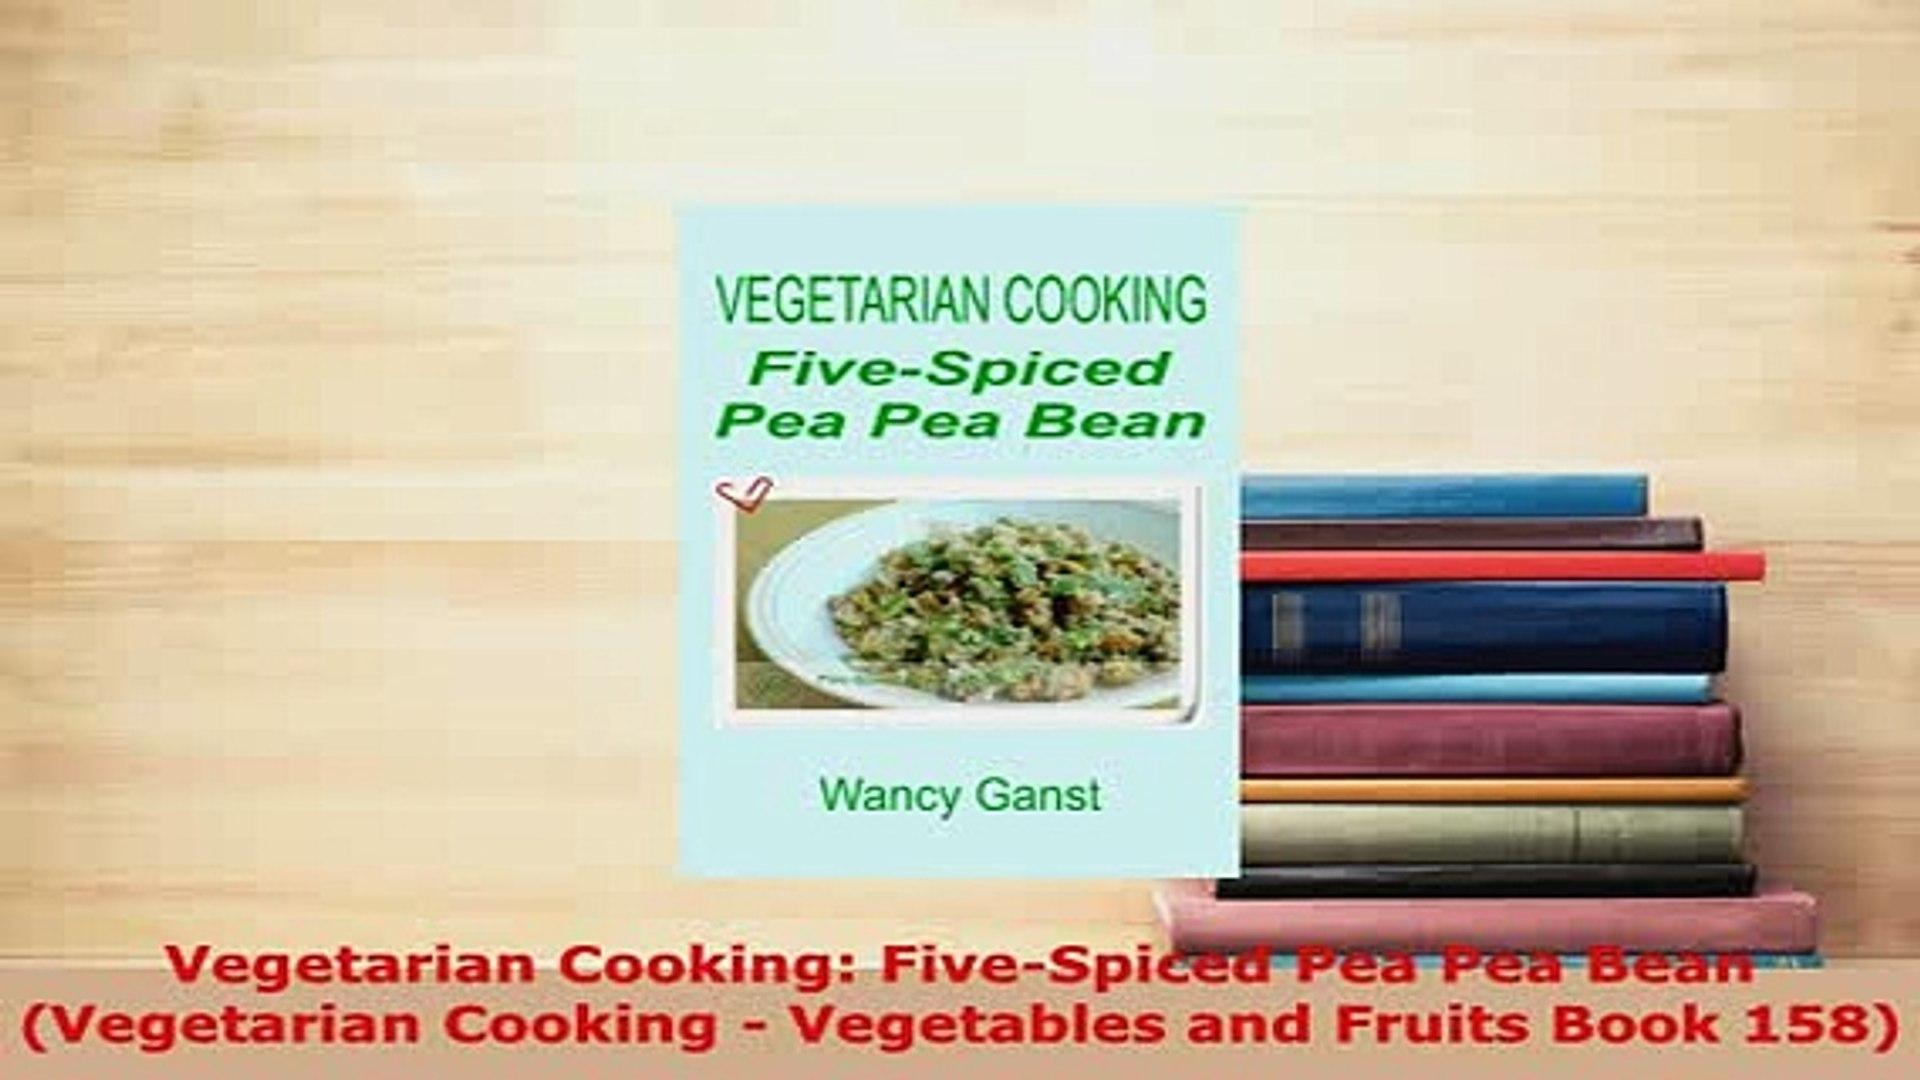 Vegetarian Cooking: Five-Spiced Pea Pea Bean (Vegetarian Cooking - Vegetables and Fruits Book 158)